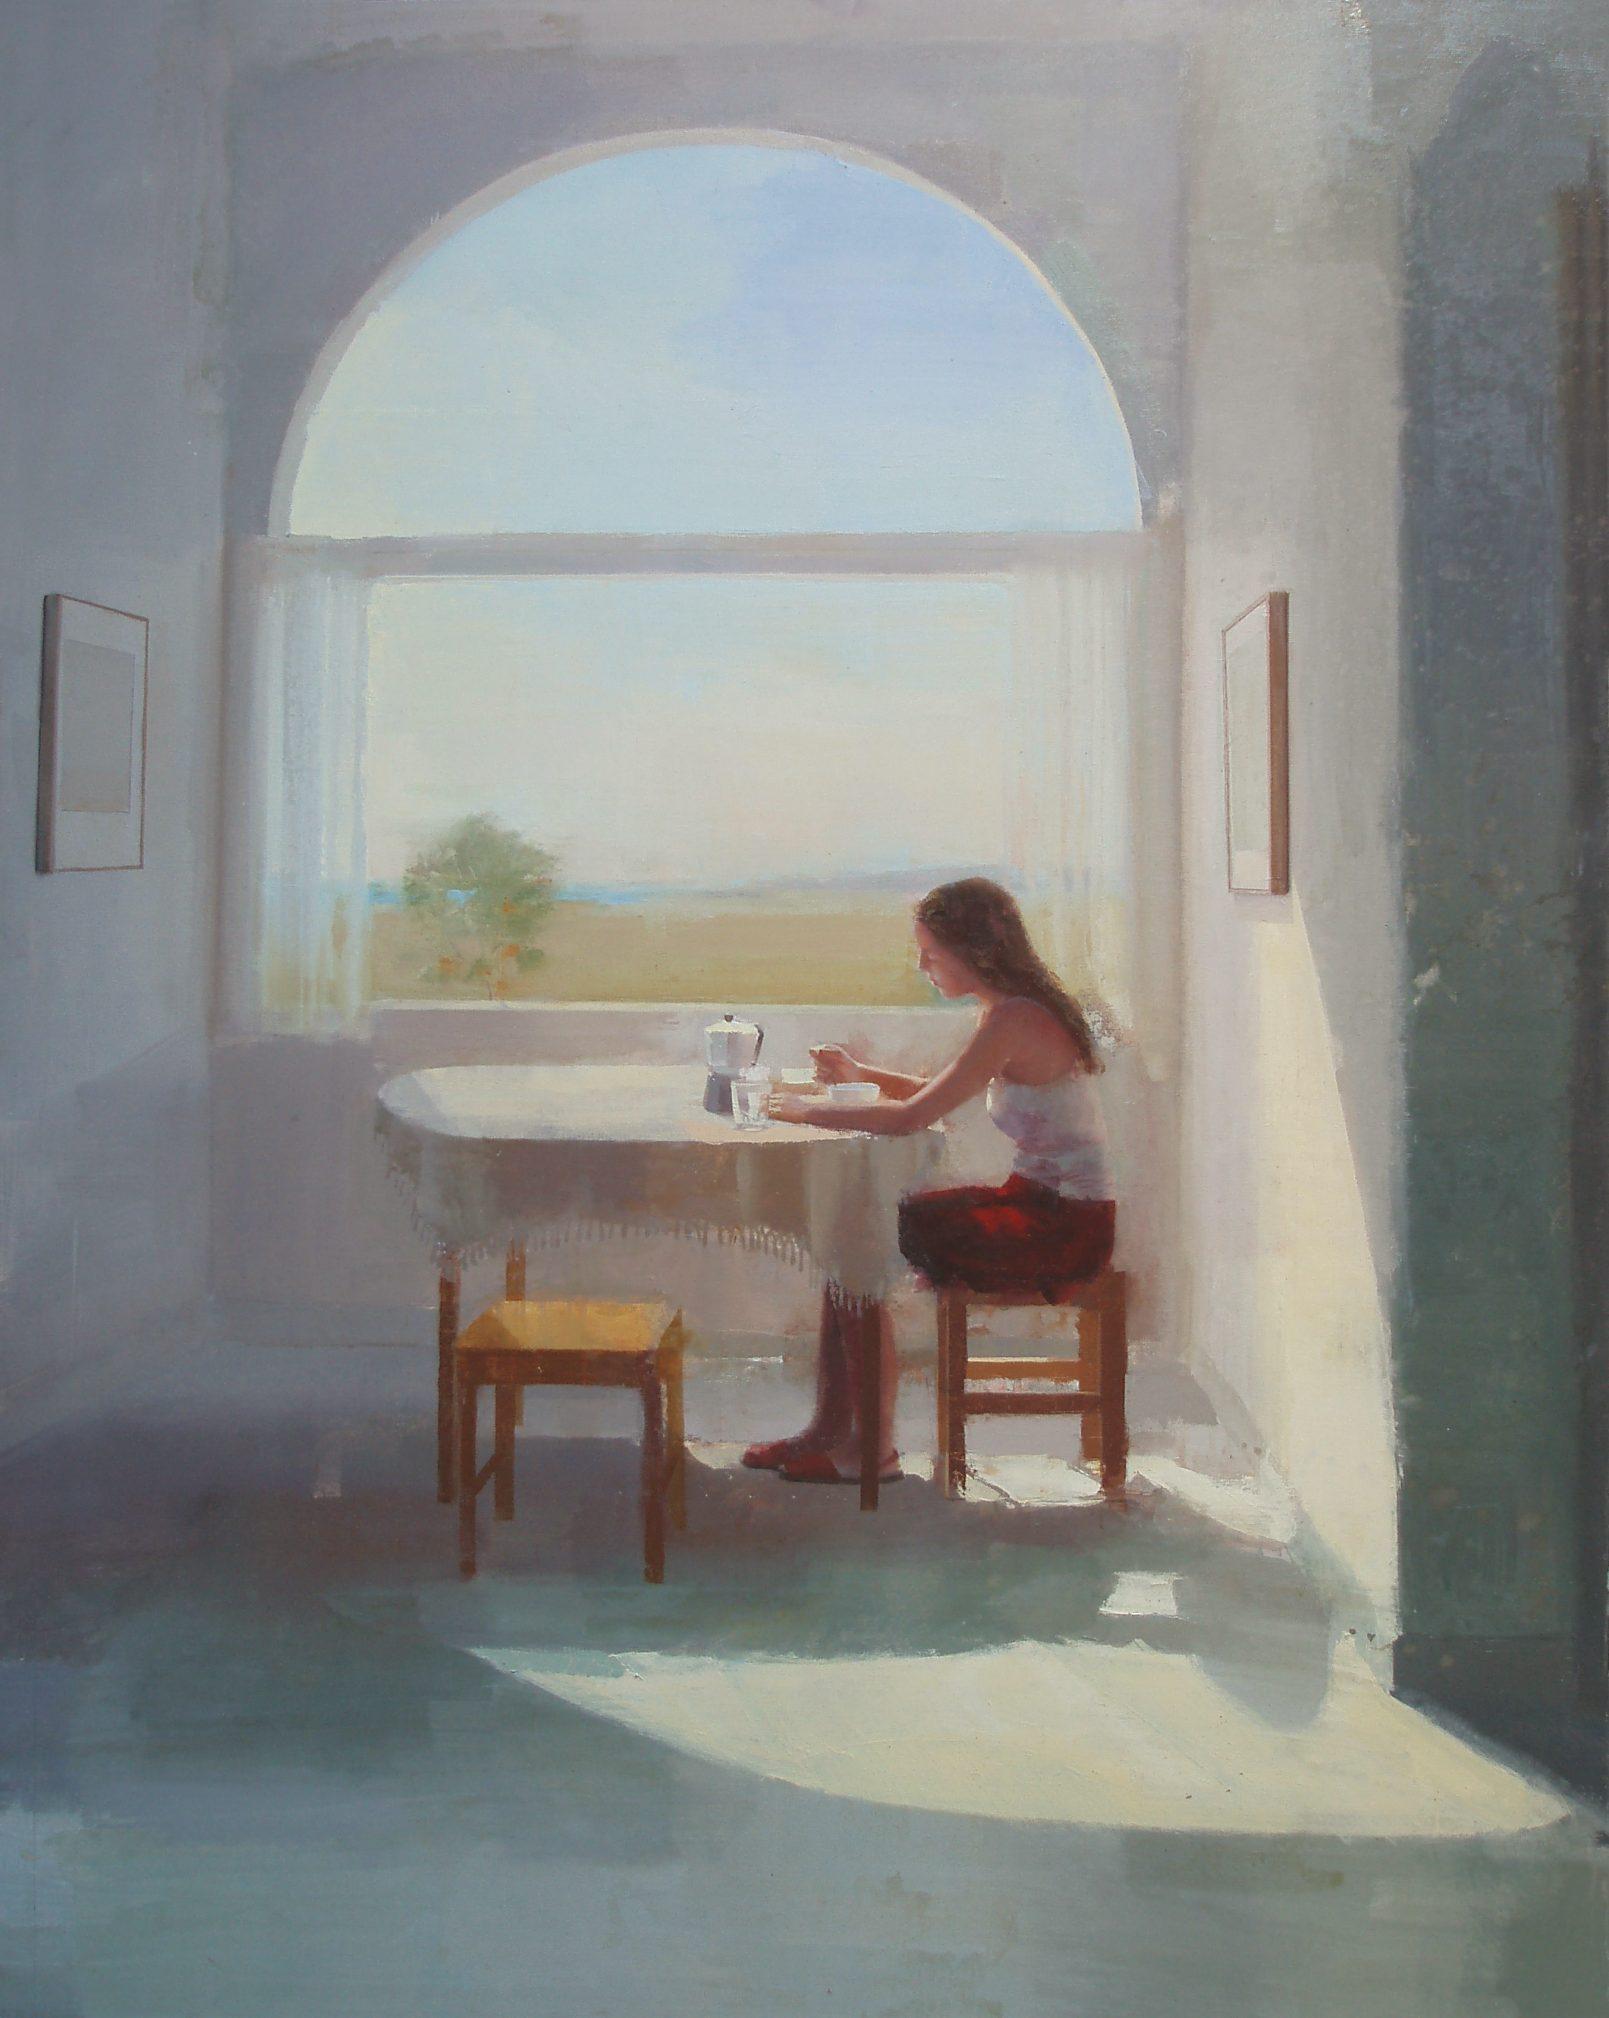 desayuno-interior-mujer-oleo-luminoso-luz-alejandra-caballero